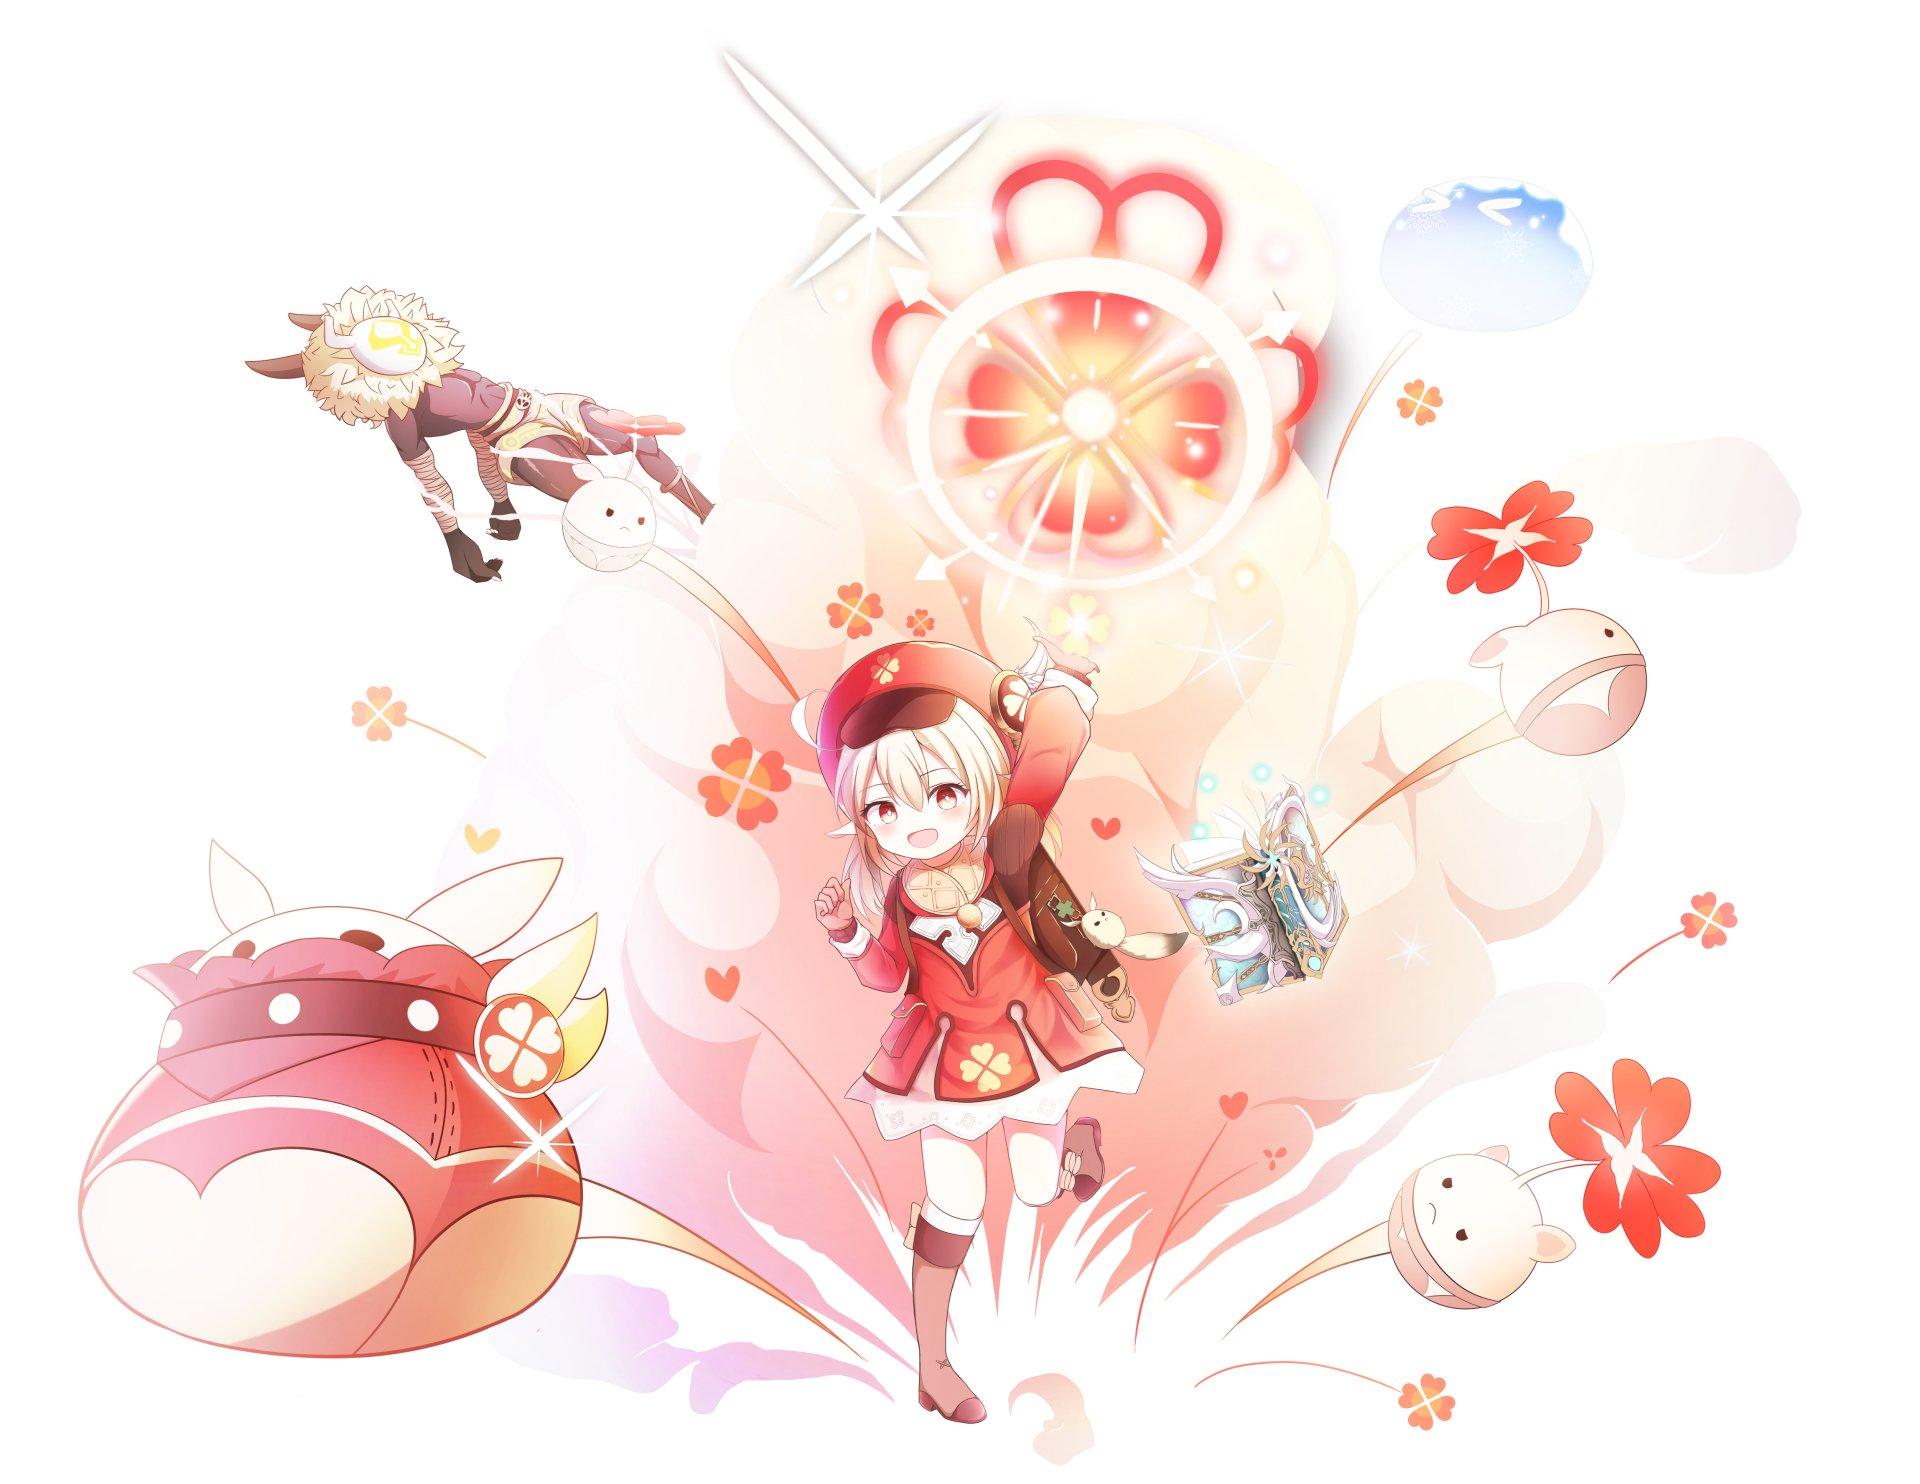 Klee Genshin Impact Loli Wallpaper